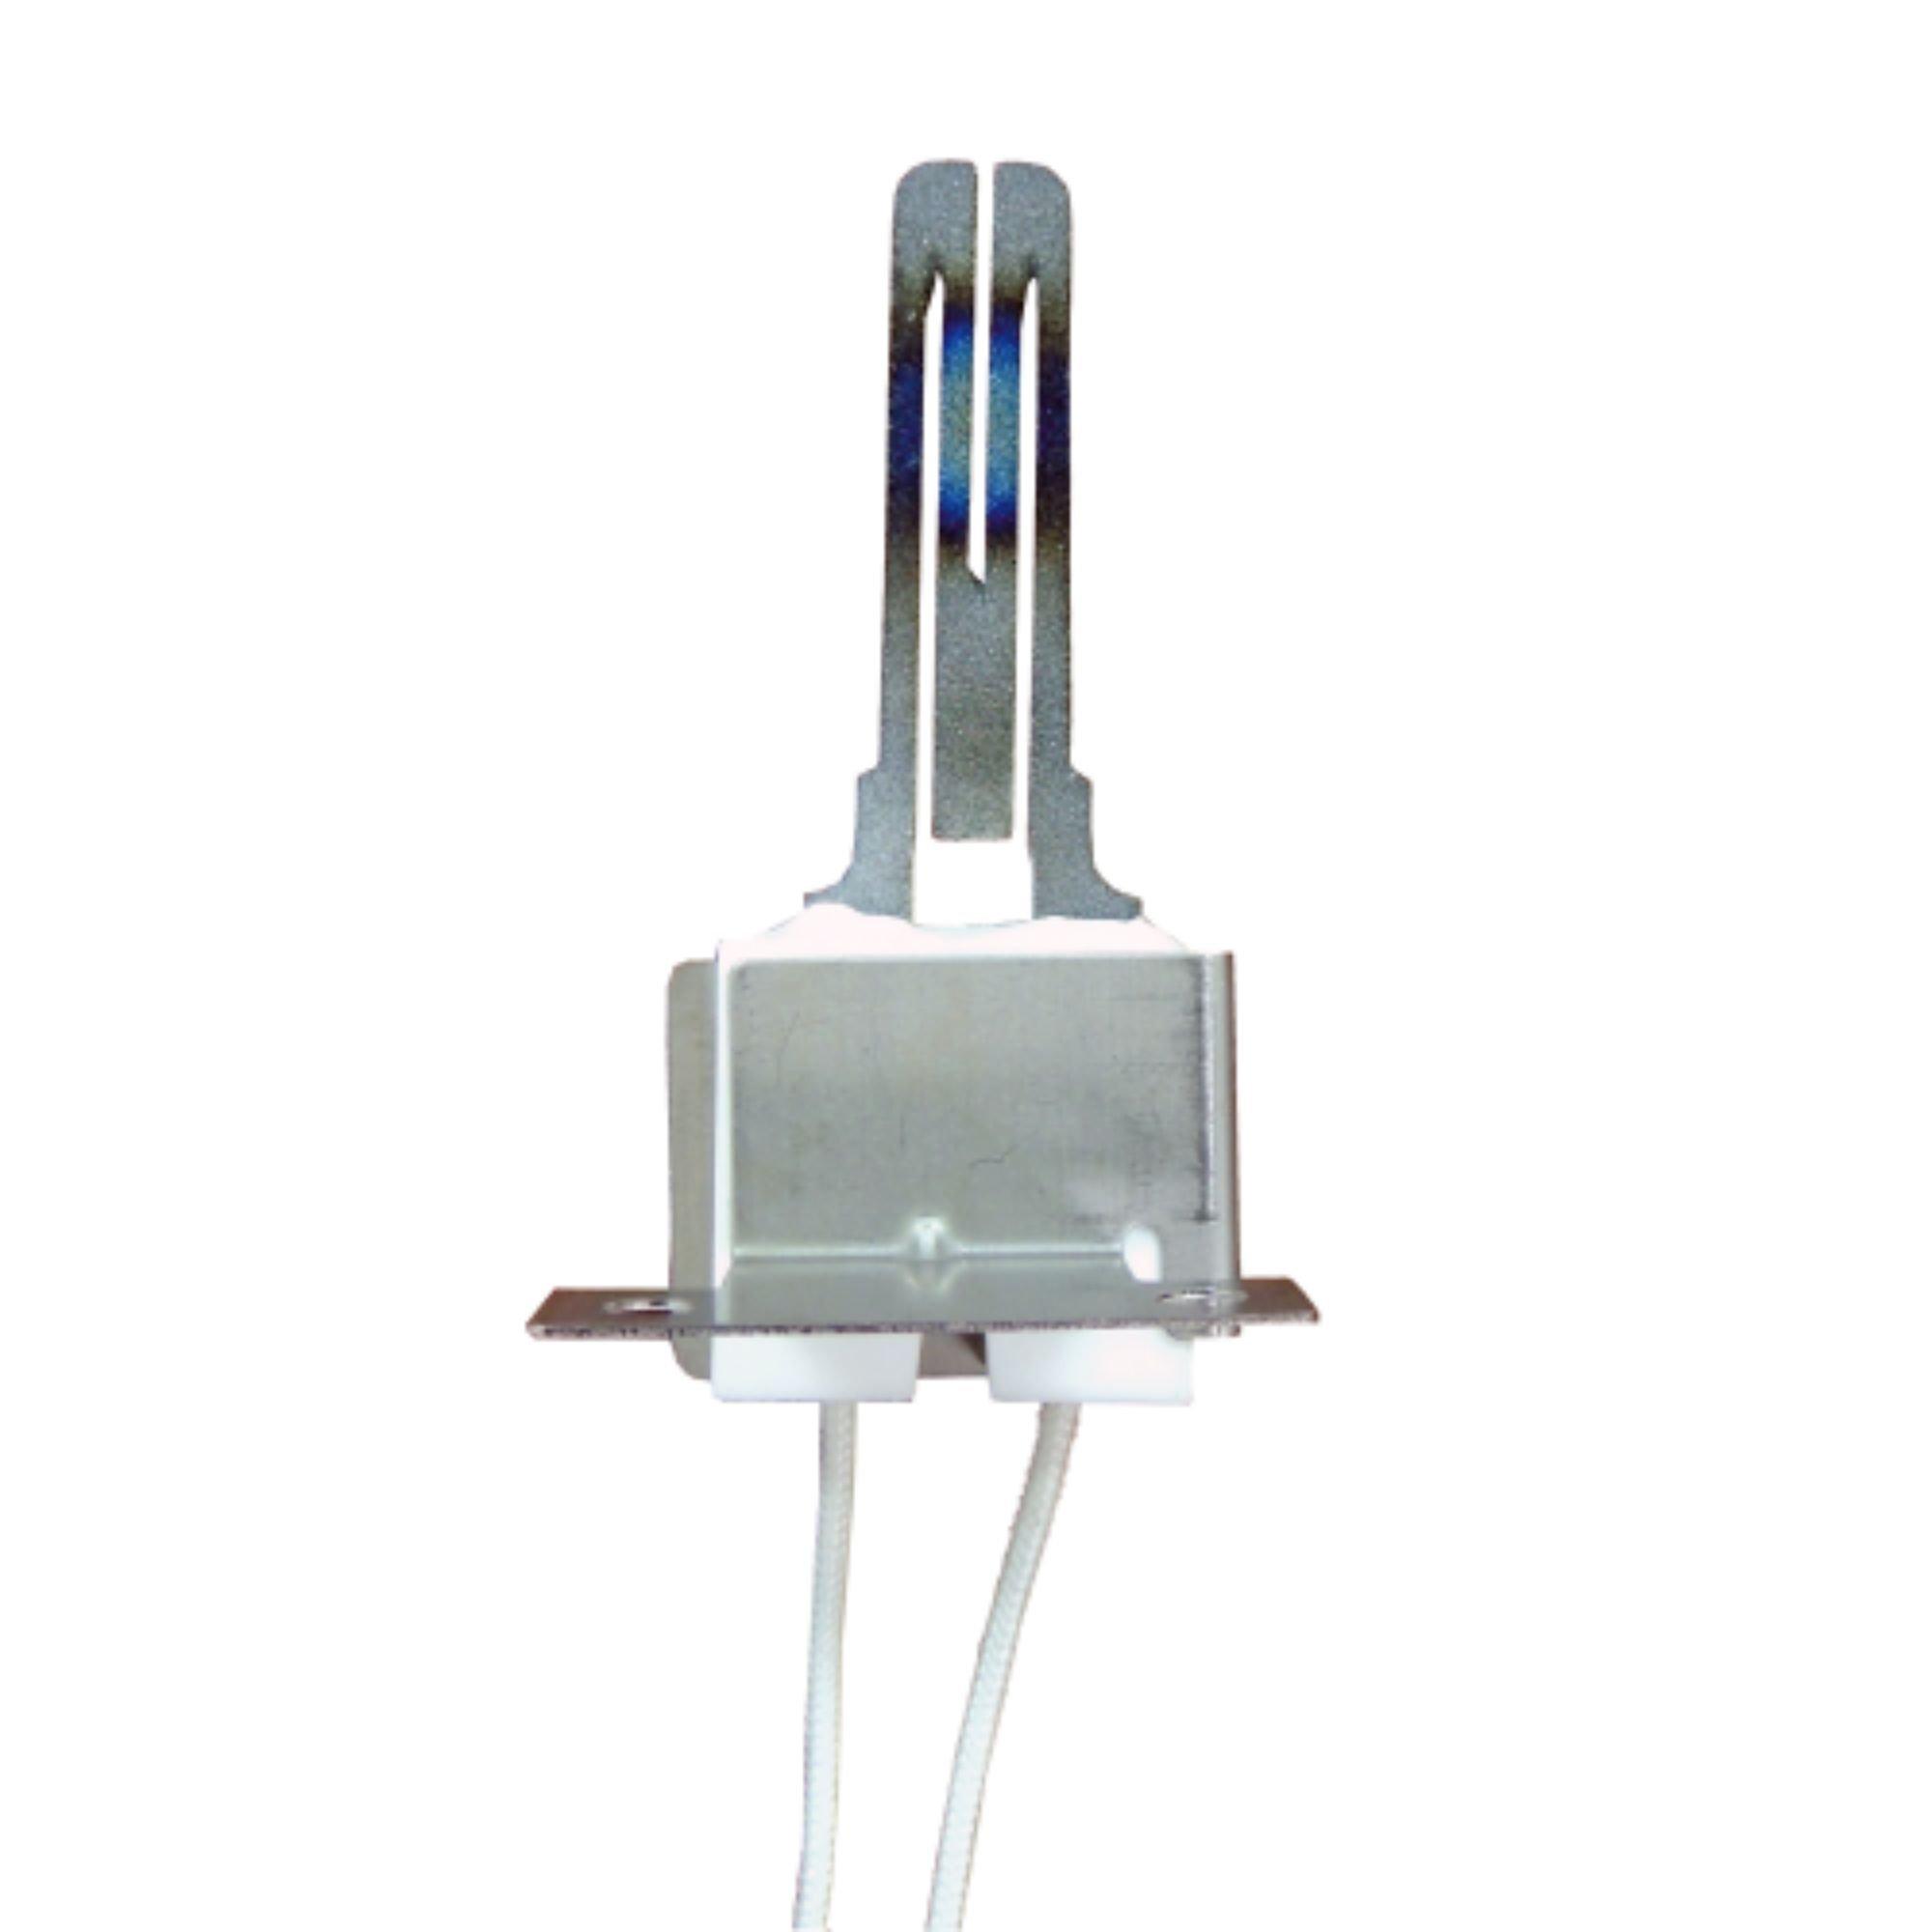 IG418 Ignitor for B1401018S B1401015 Janitrol Goodman Furnace Igniter